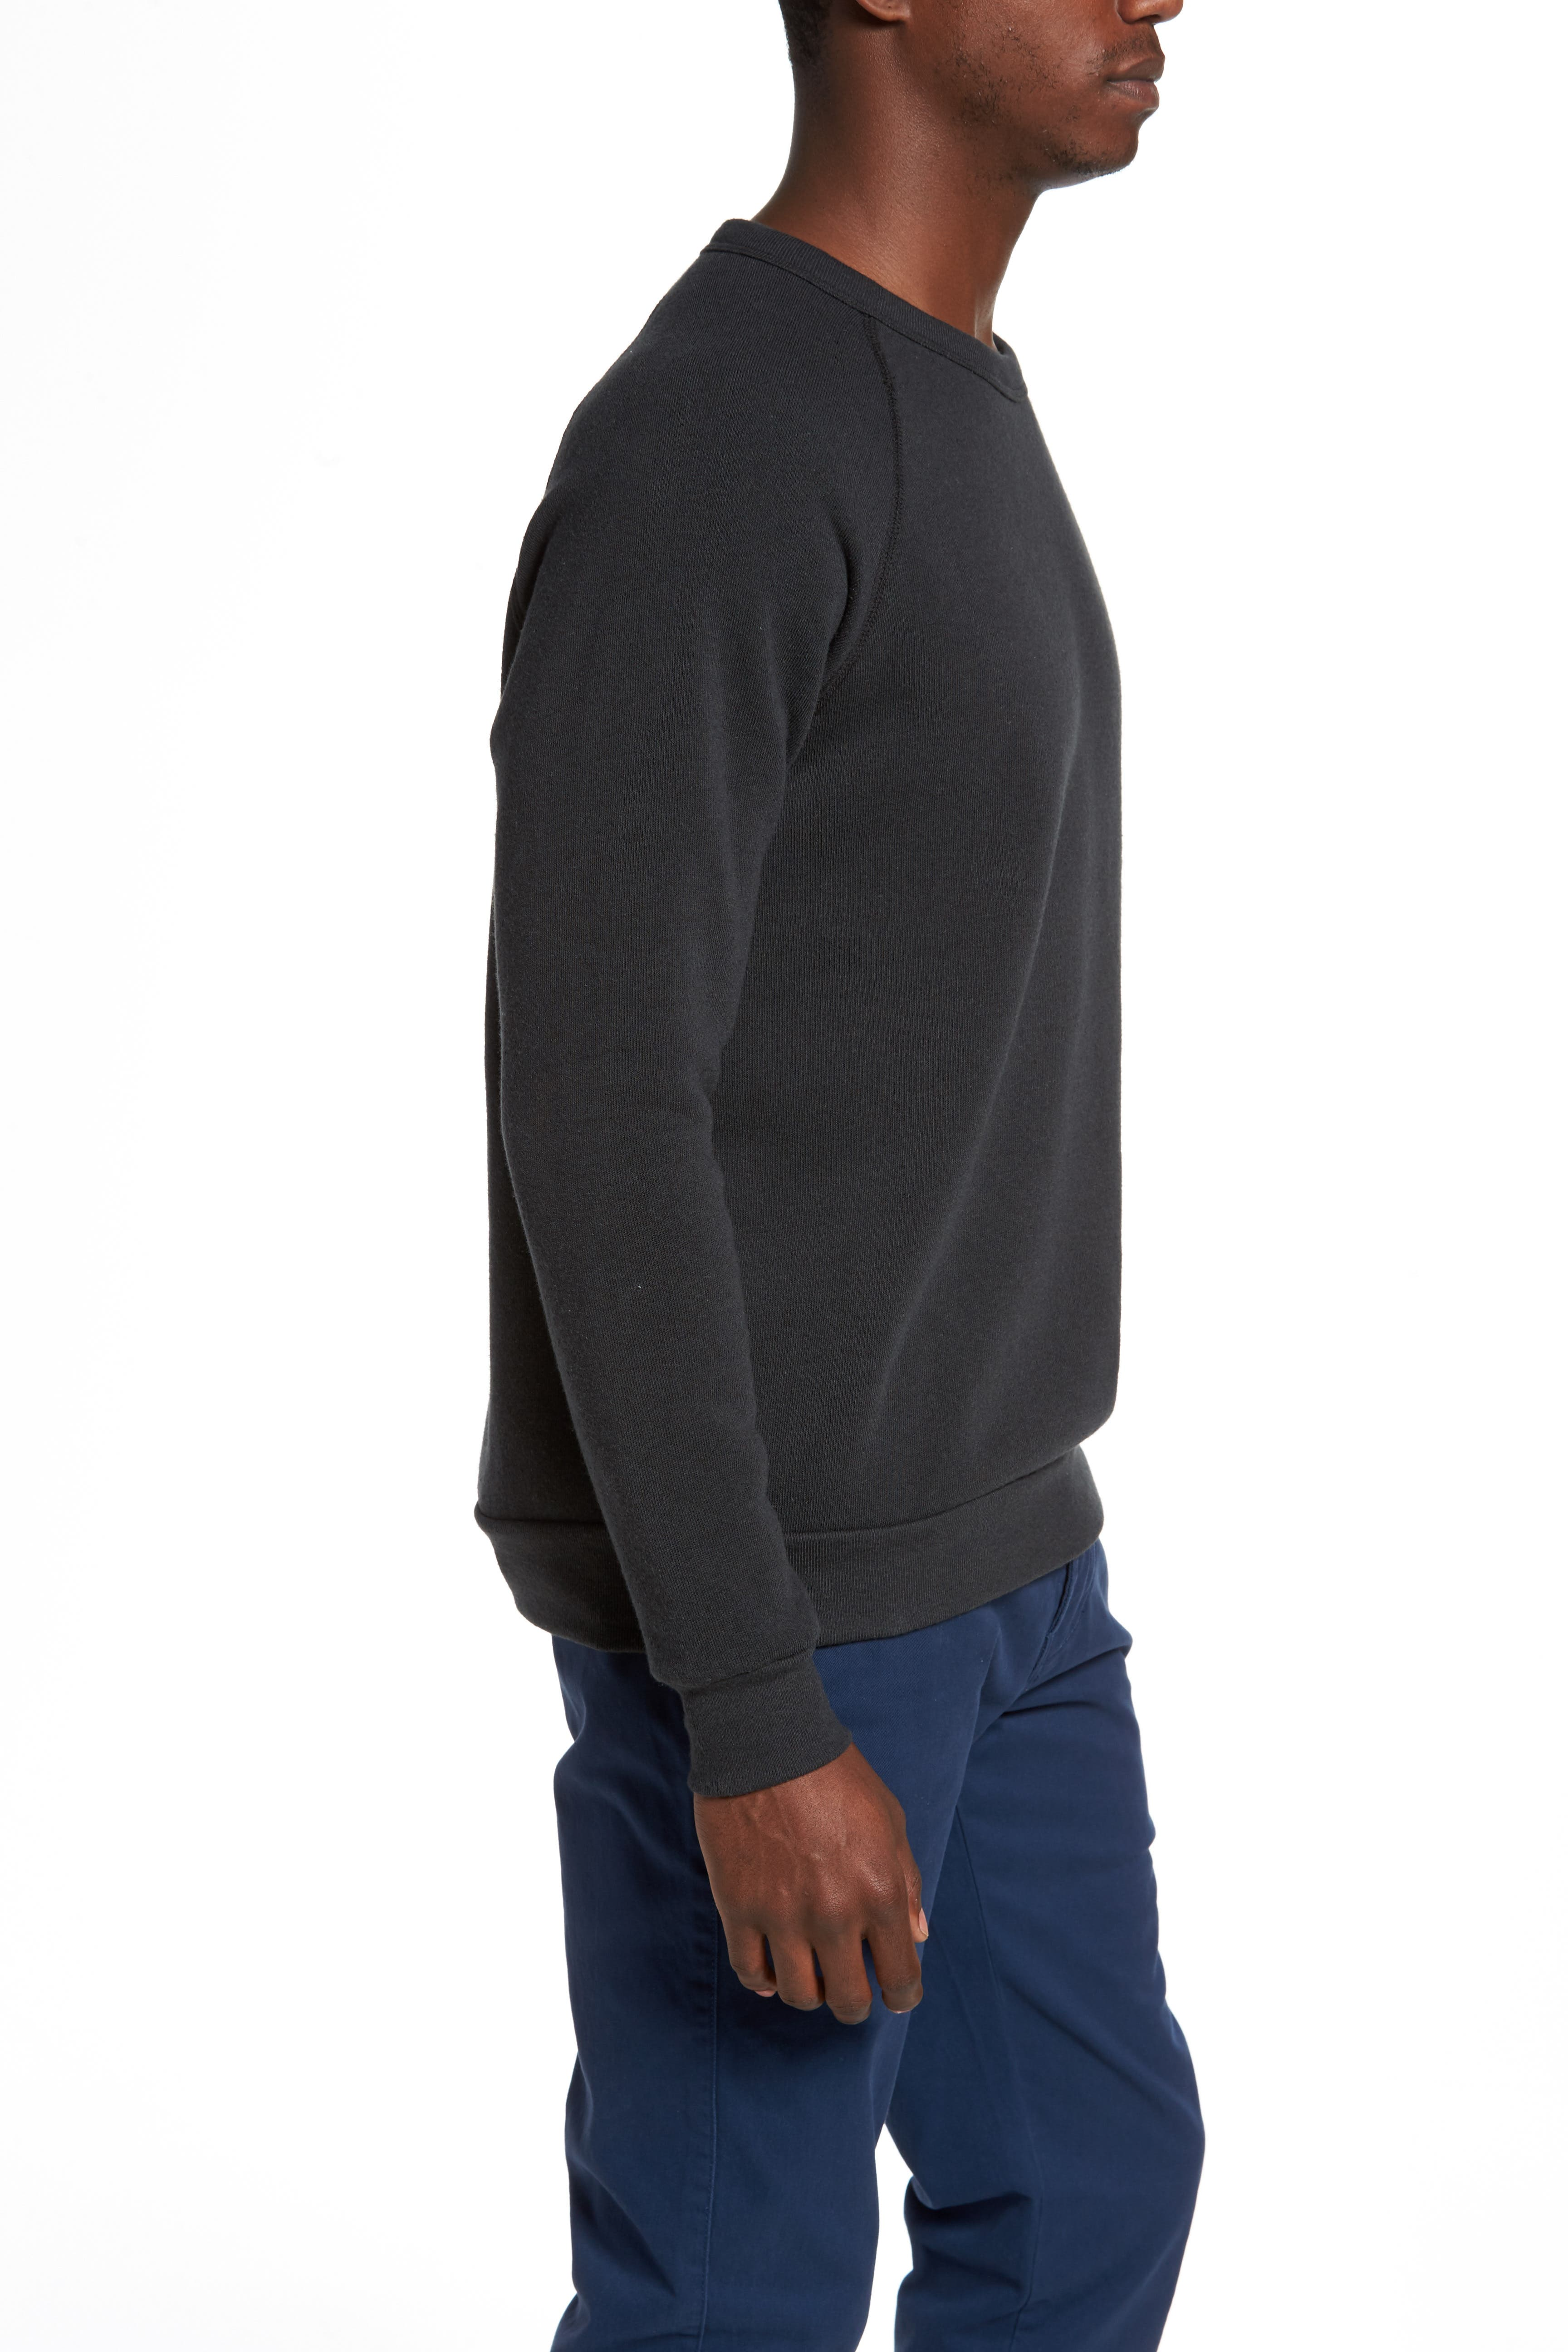 'The Champ' Sweatshirt,                             Alternate thumbnail 56, color,